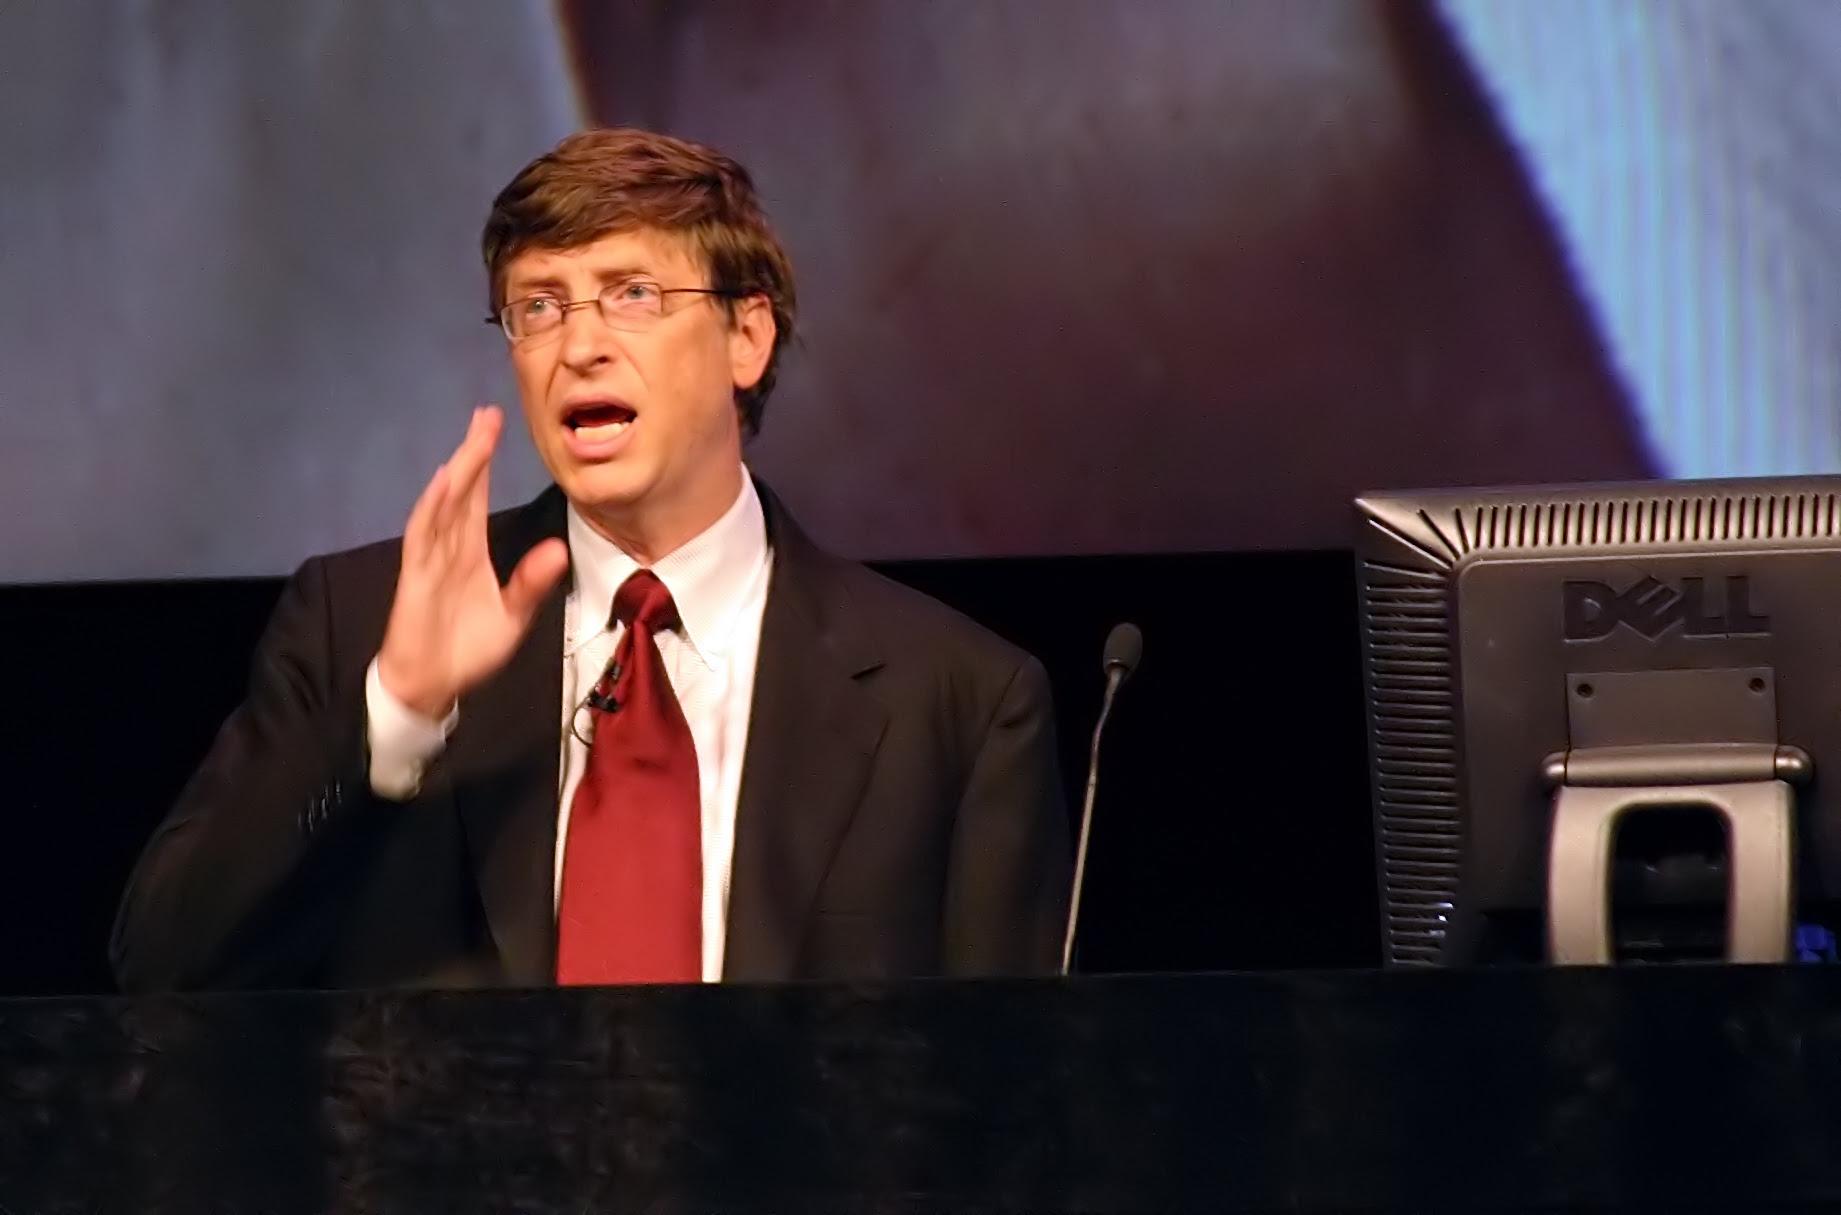 Bill Gates, famoso empresario de Microsoft